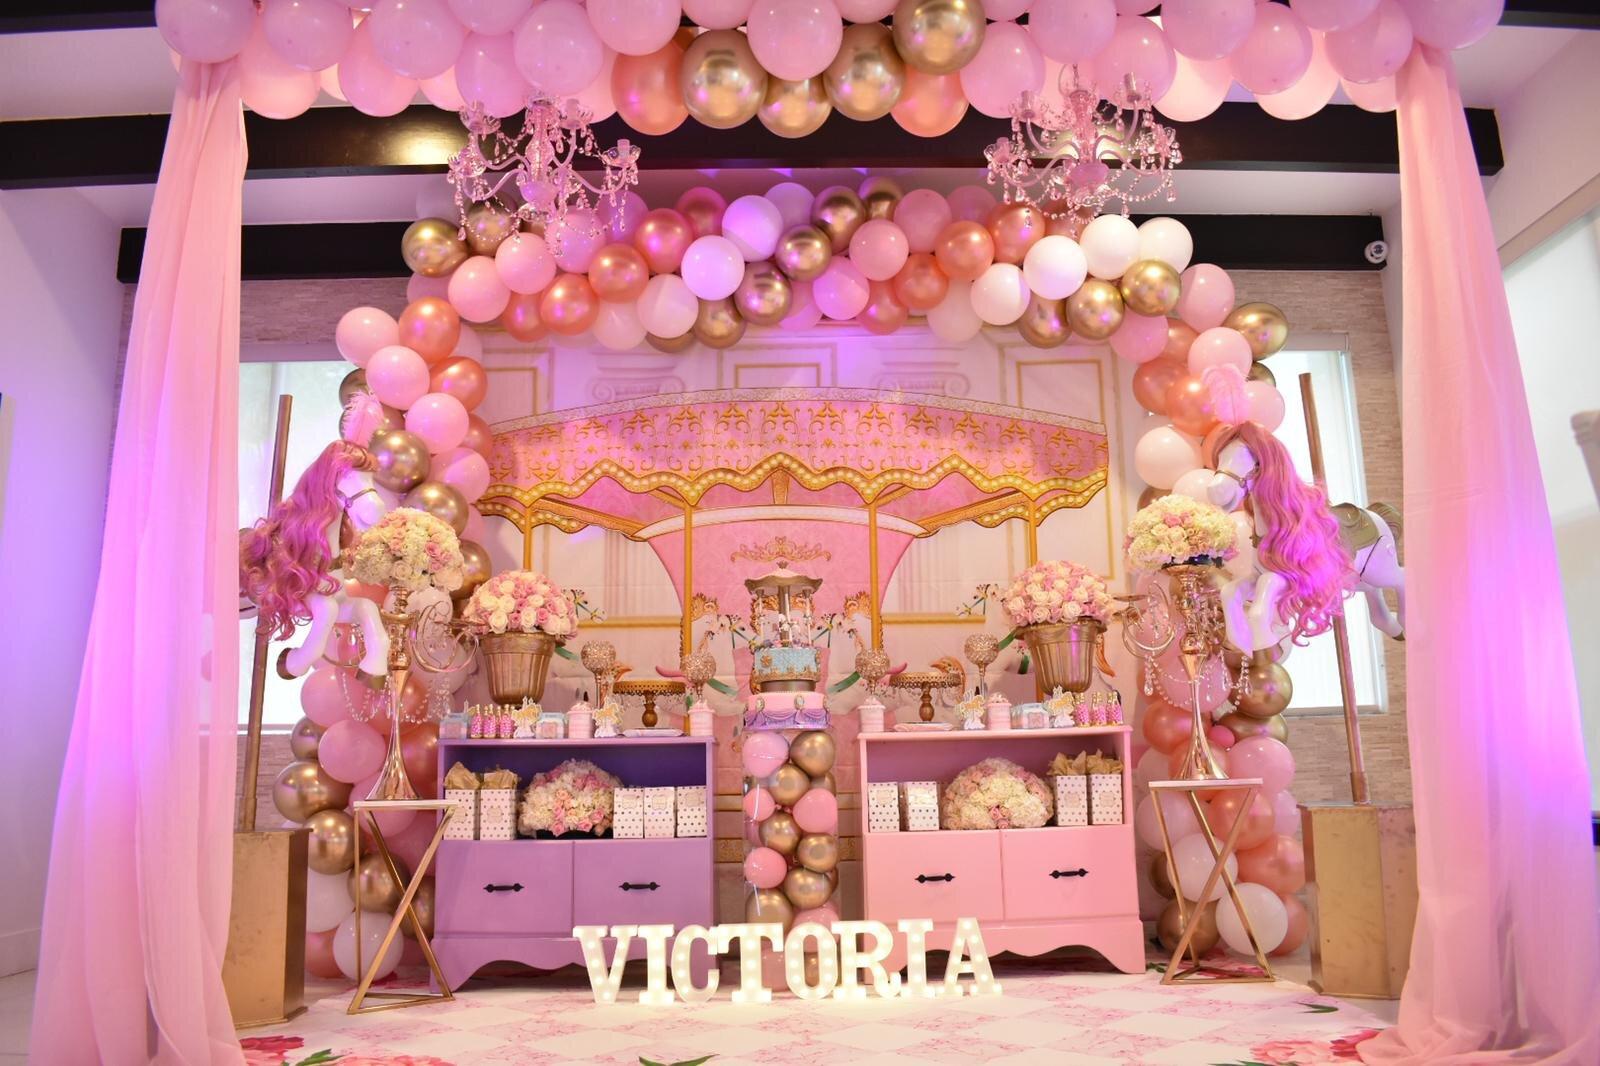 victoria room decoration